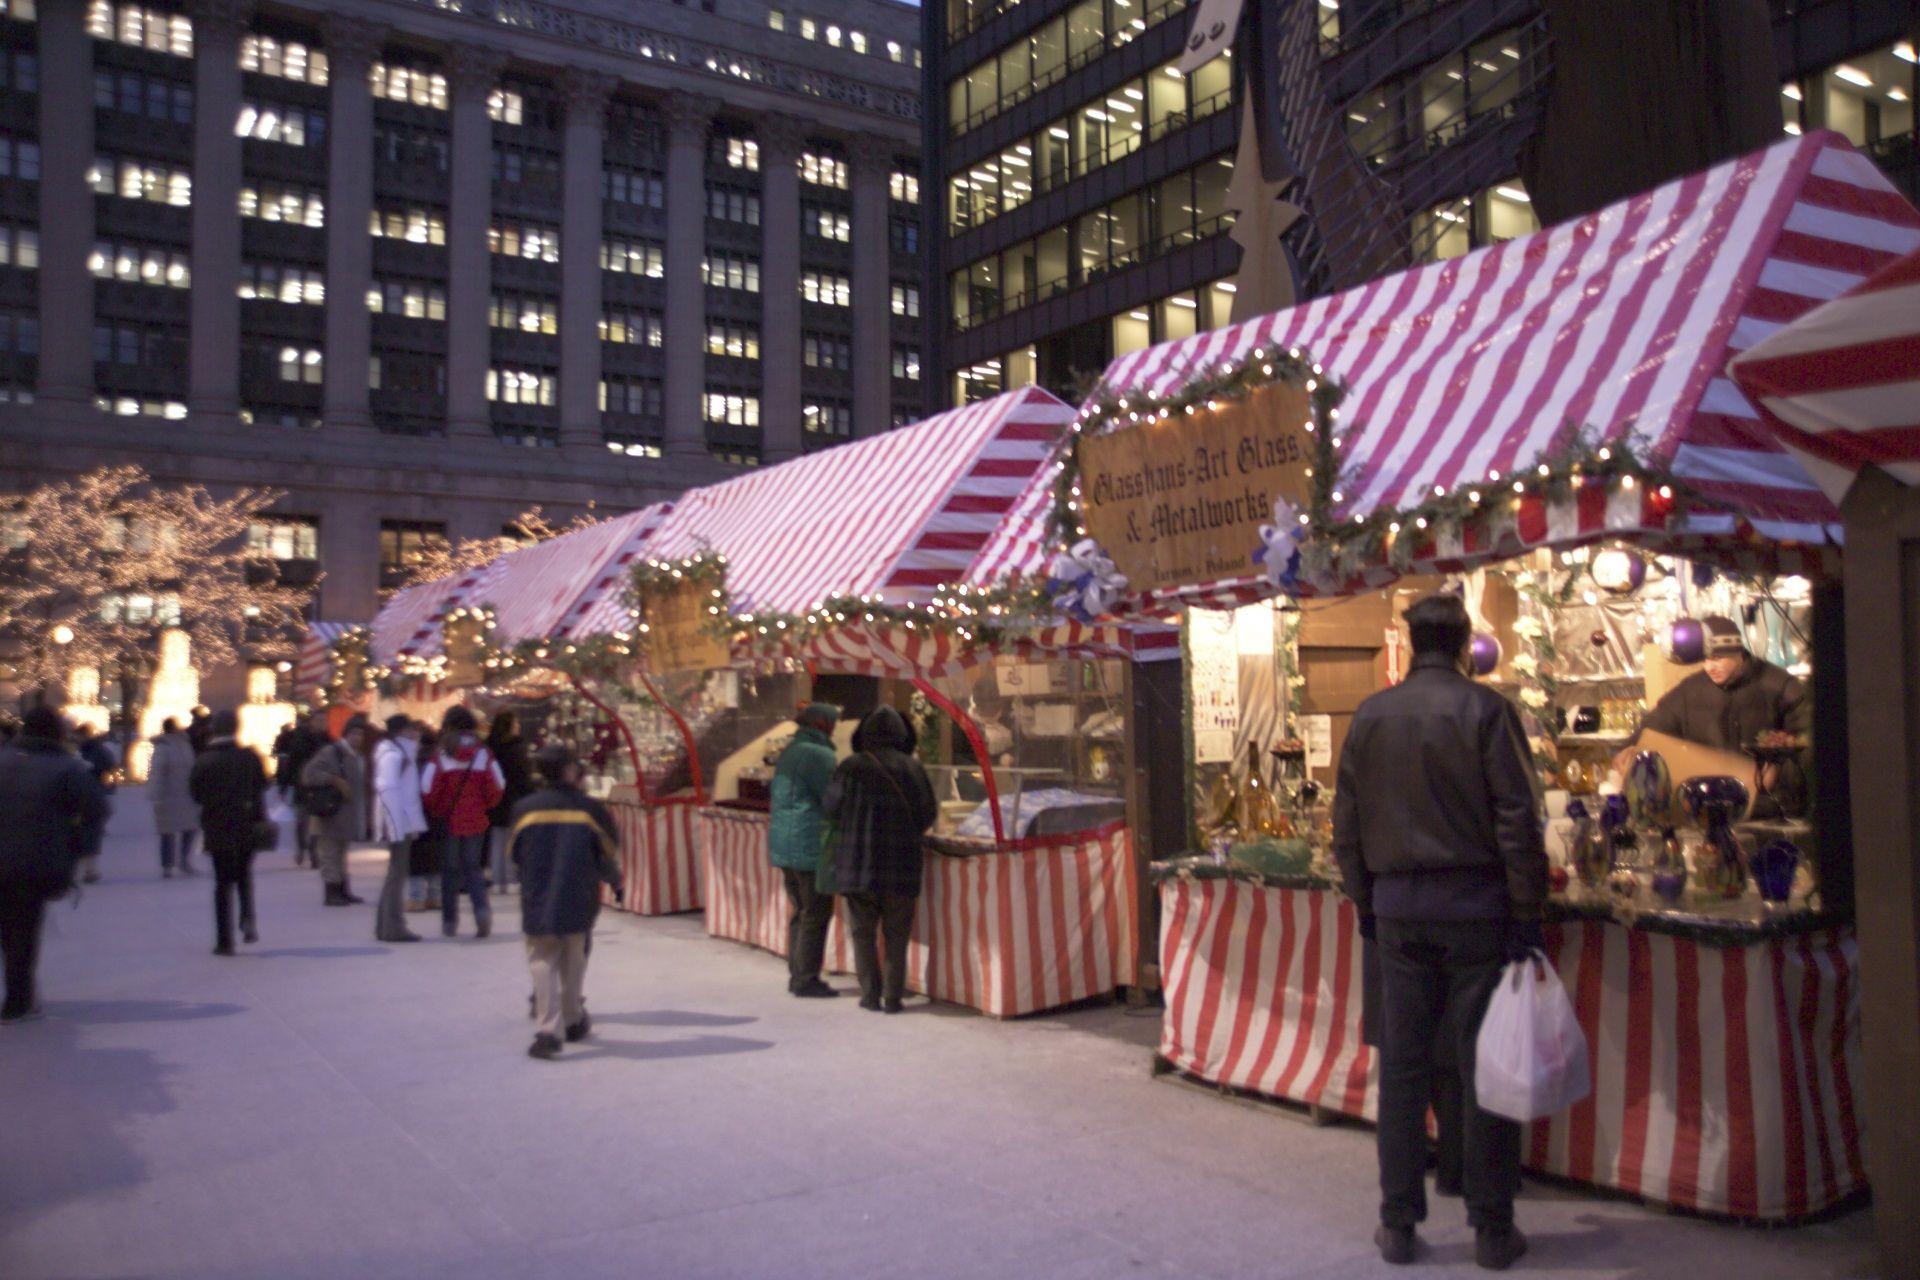 Chicago Christmas Market.Christmas Market Chicago Christmas Market Nuremberg S